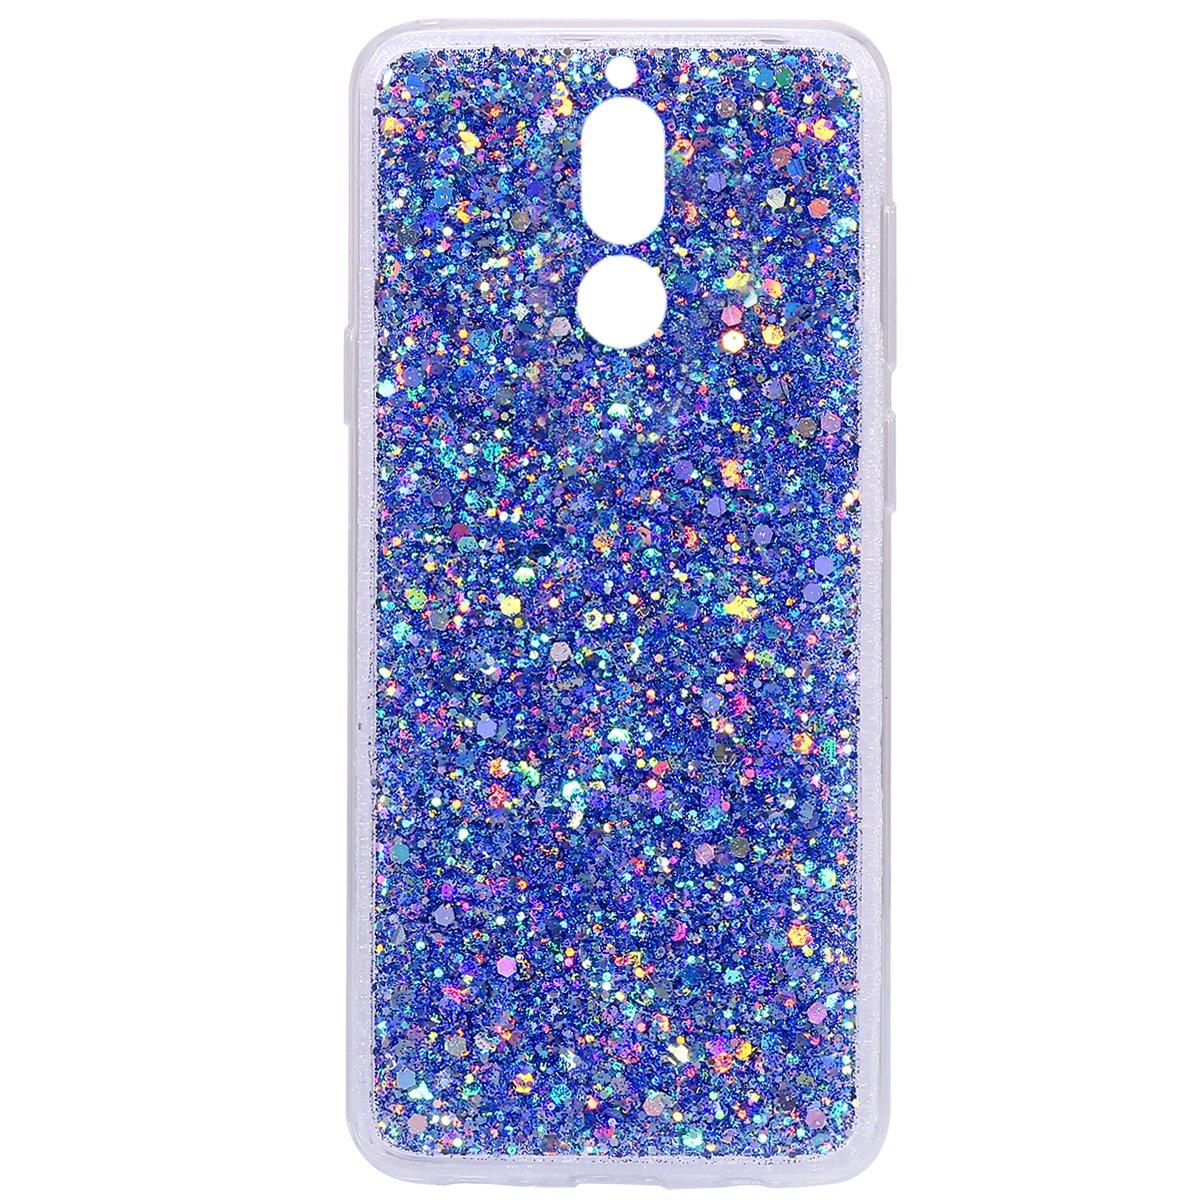 ikasus brillante brillante con purpurina en polvo 3D de diamante Paillette delgado con purpurina flexible de goma suave TPU carcasa prot funda para Huawei Mate 10 Lite Funda para Huawei Mate 10 Lite